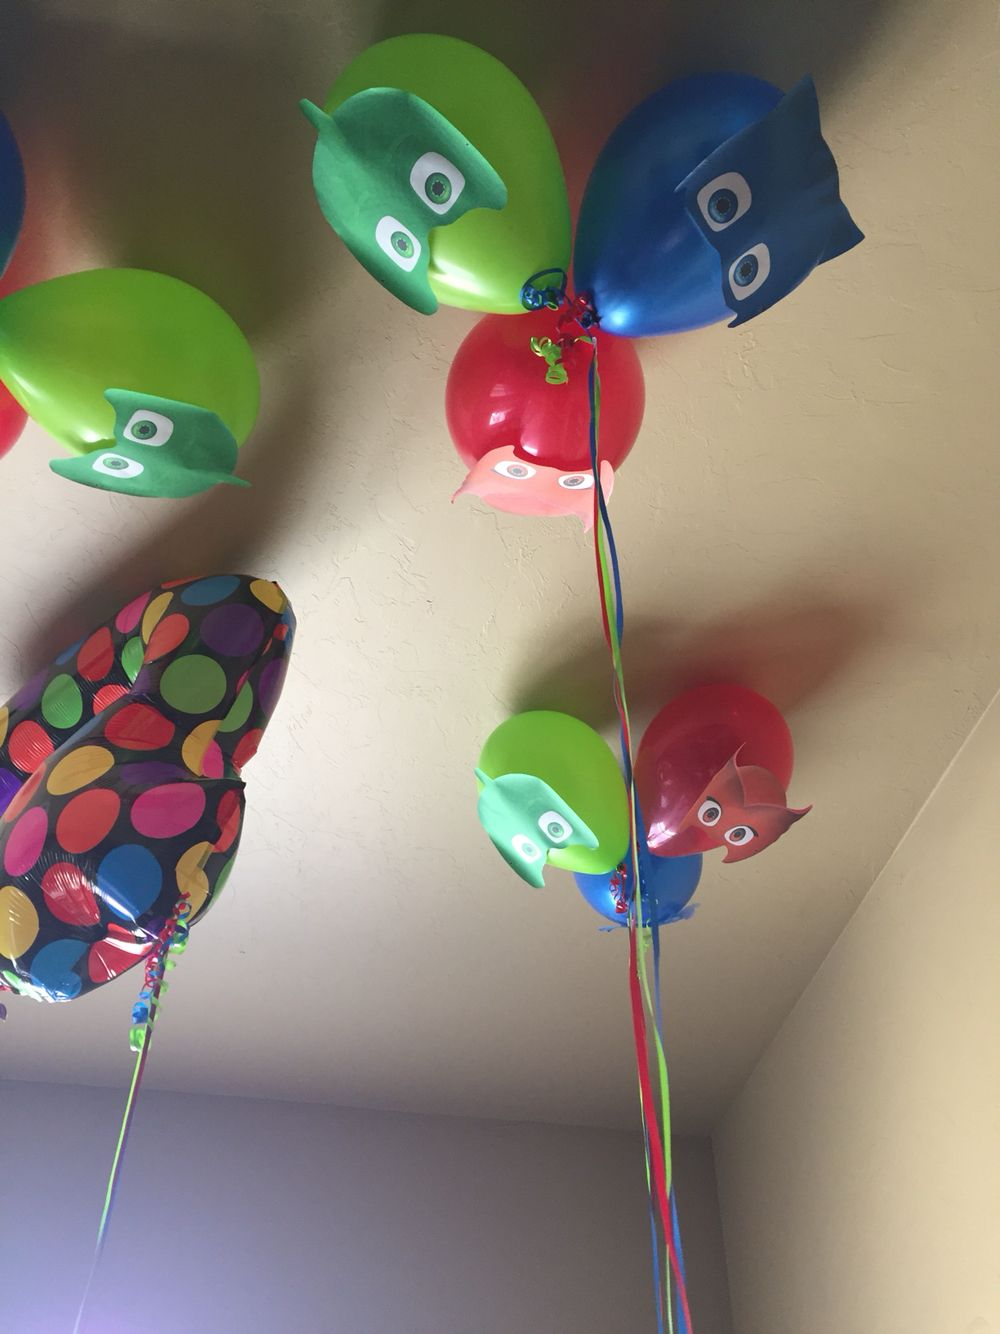 PJ Mask Balloons | PJ Masks | Pj masks balloons, Pj masks ...